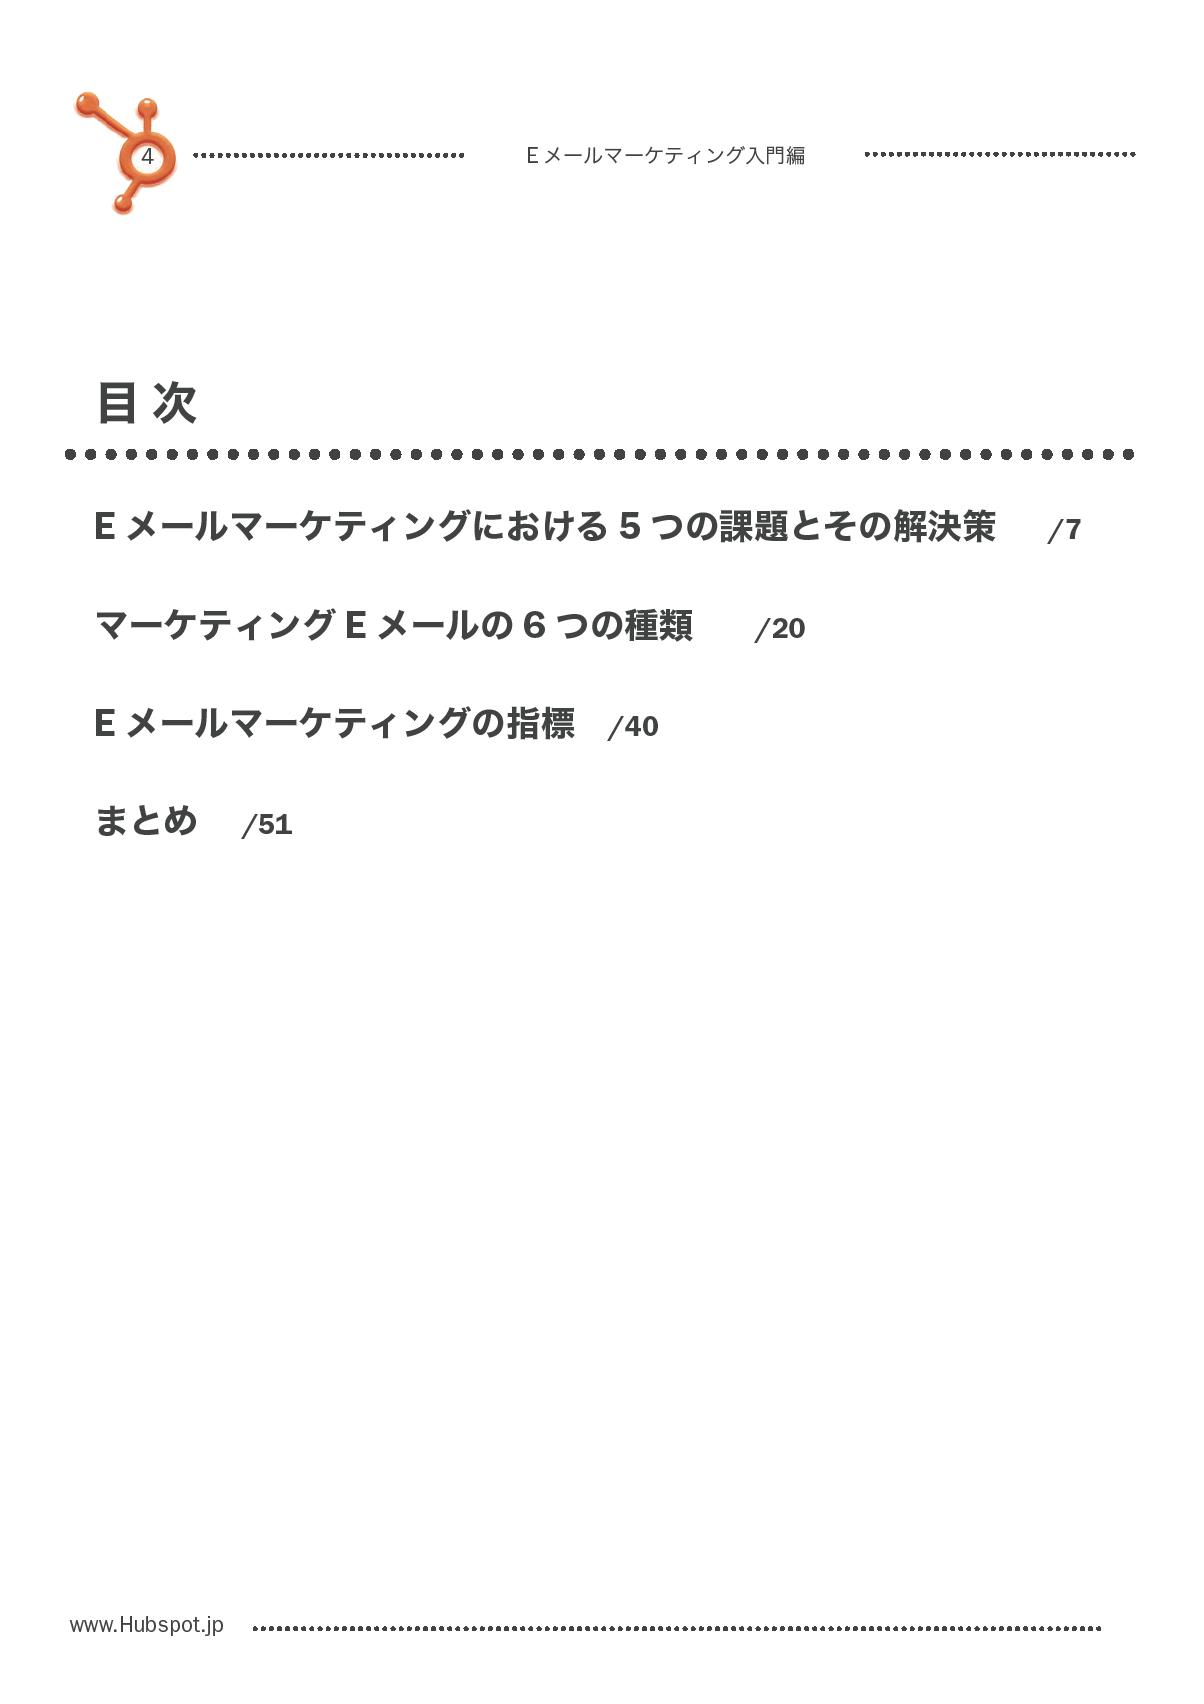 Eメールマーケティングの秘訣をまとめた無料PDF資料ダウンロード